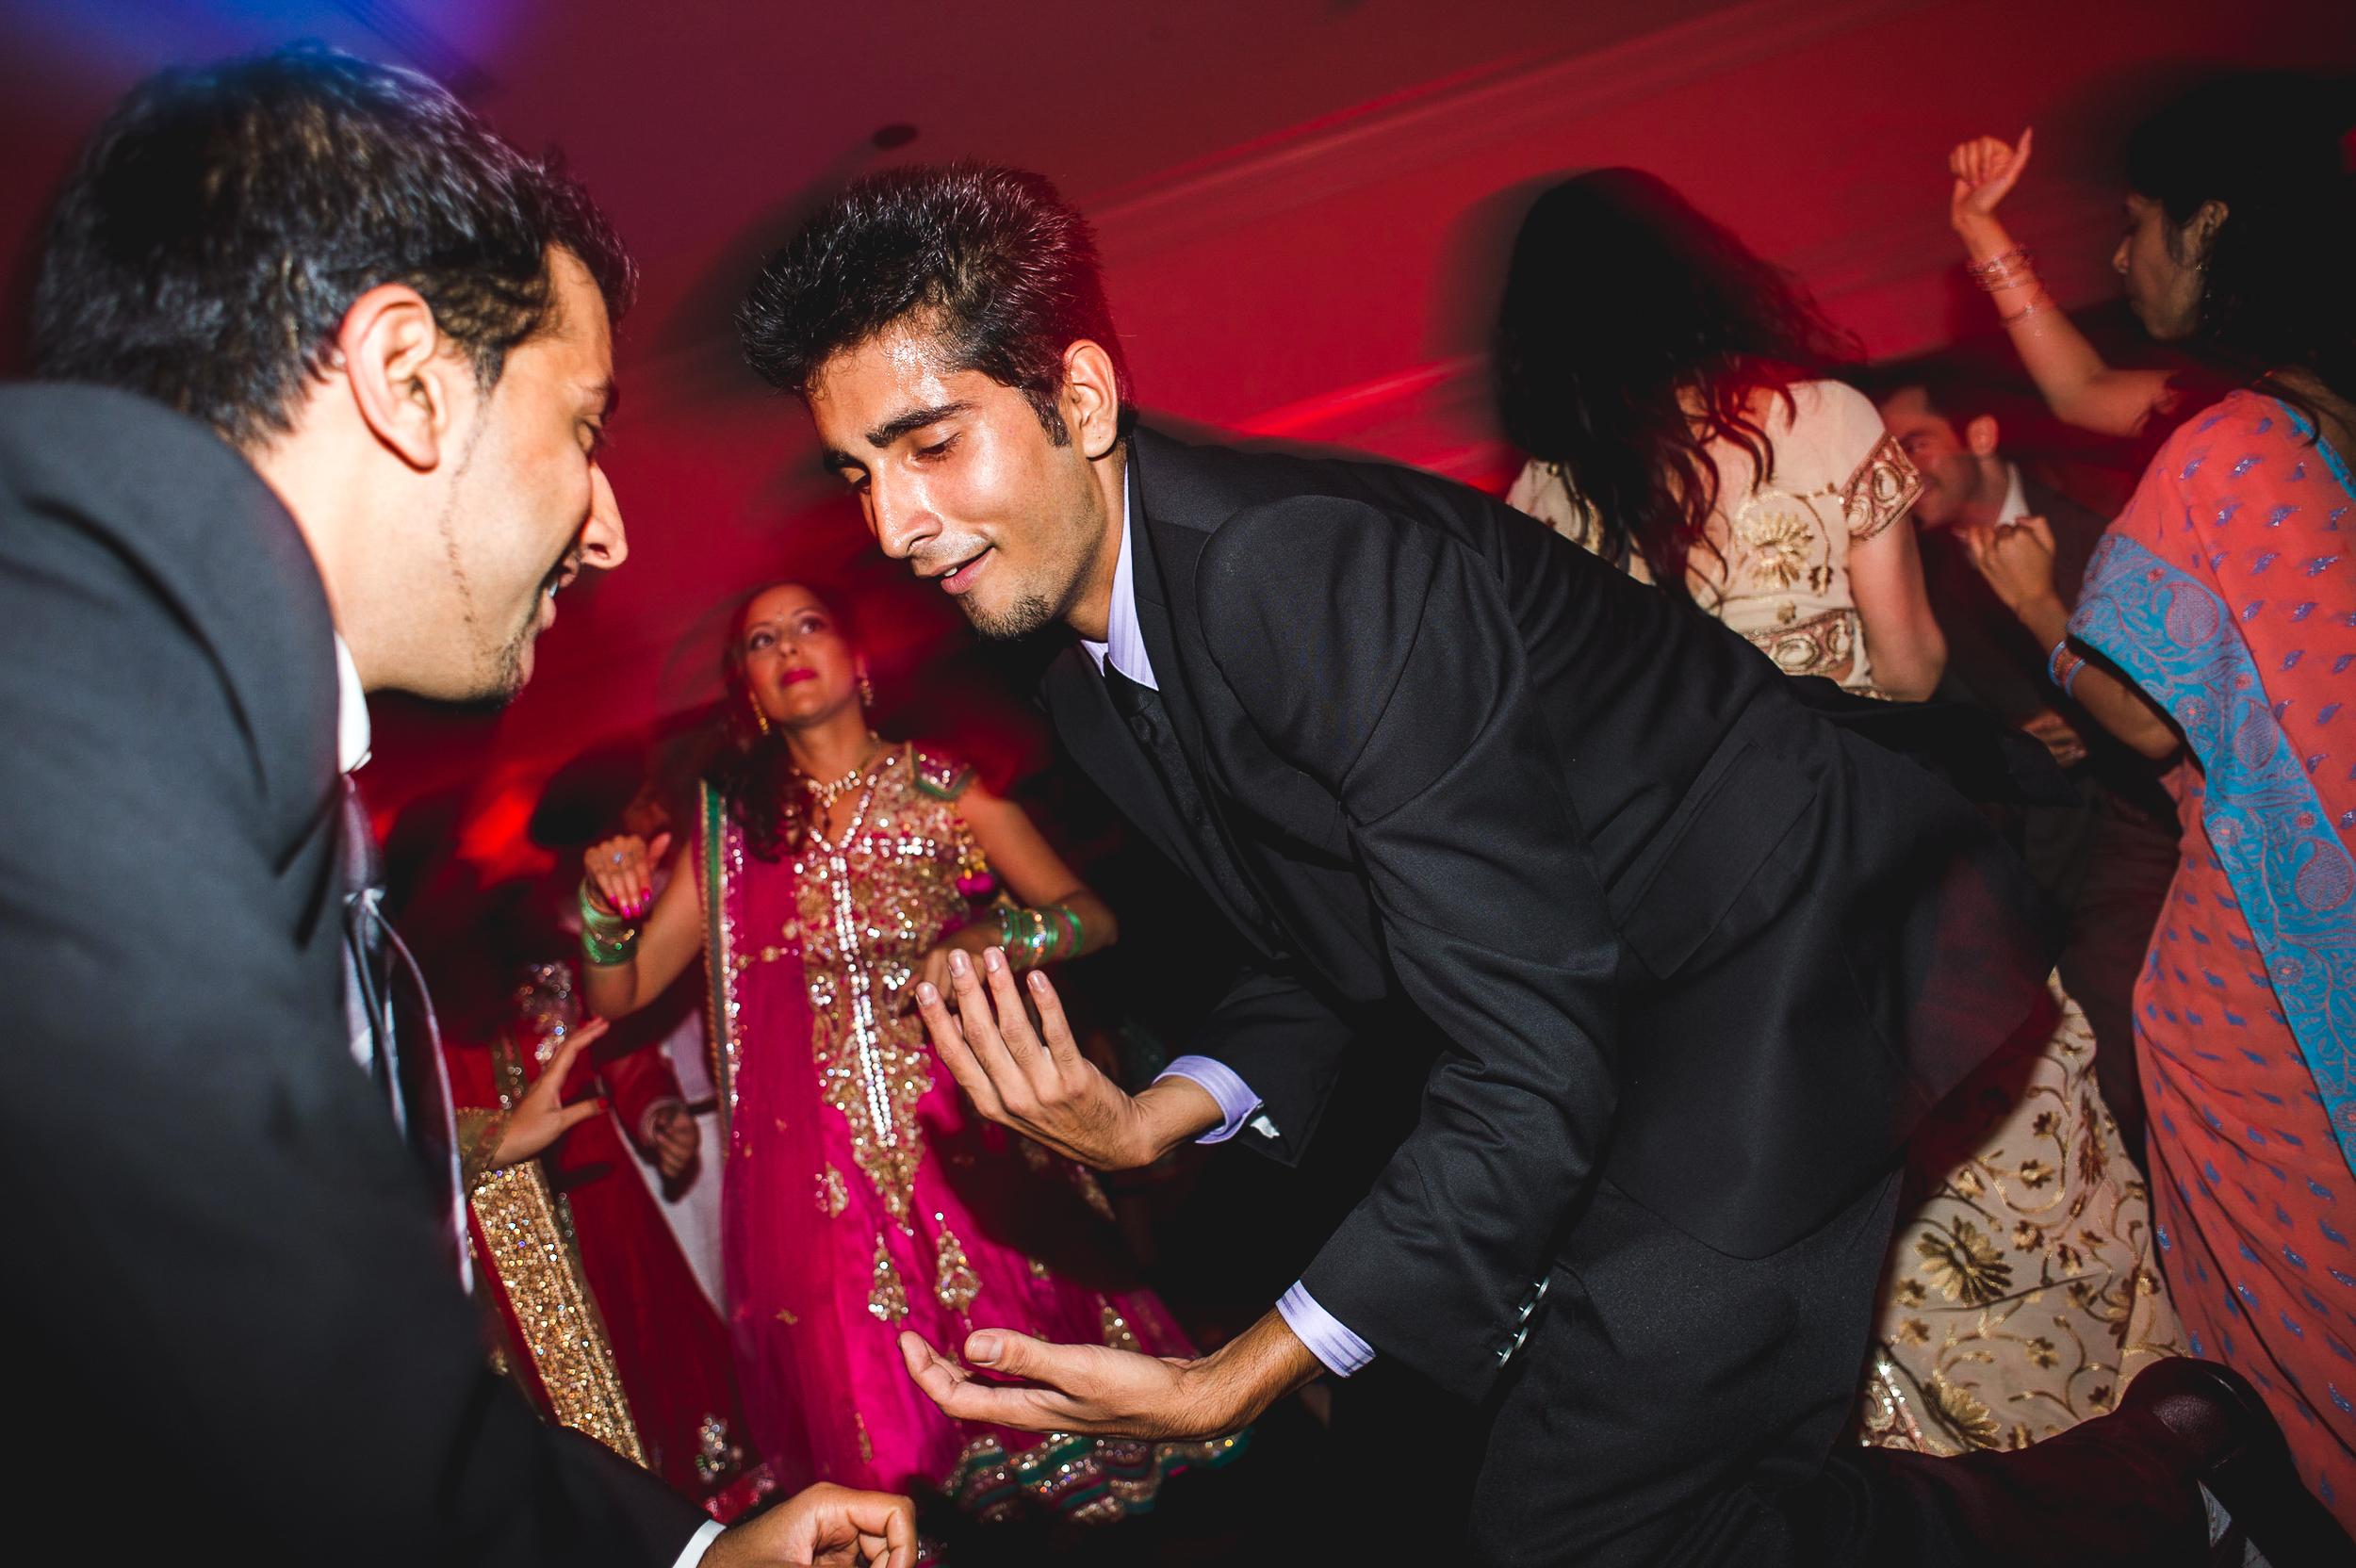 Indian wedding photographer washington dc Mantas Kubilinskas-19.jpg